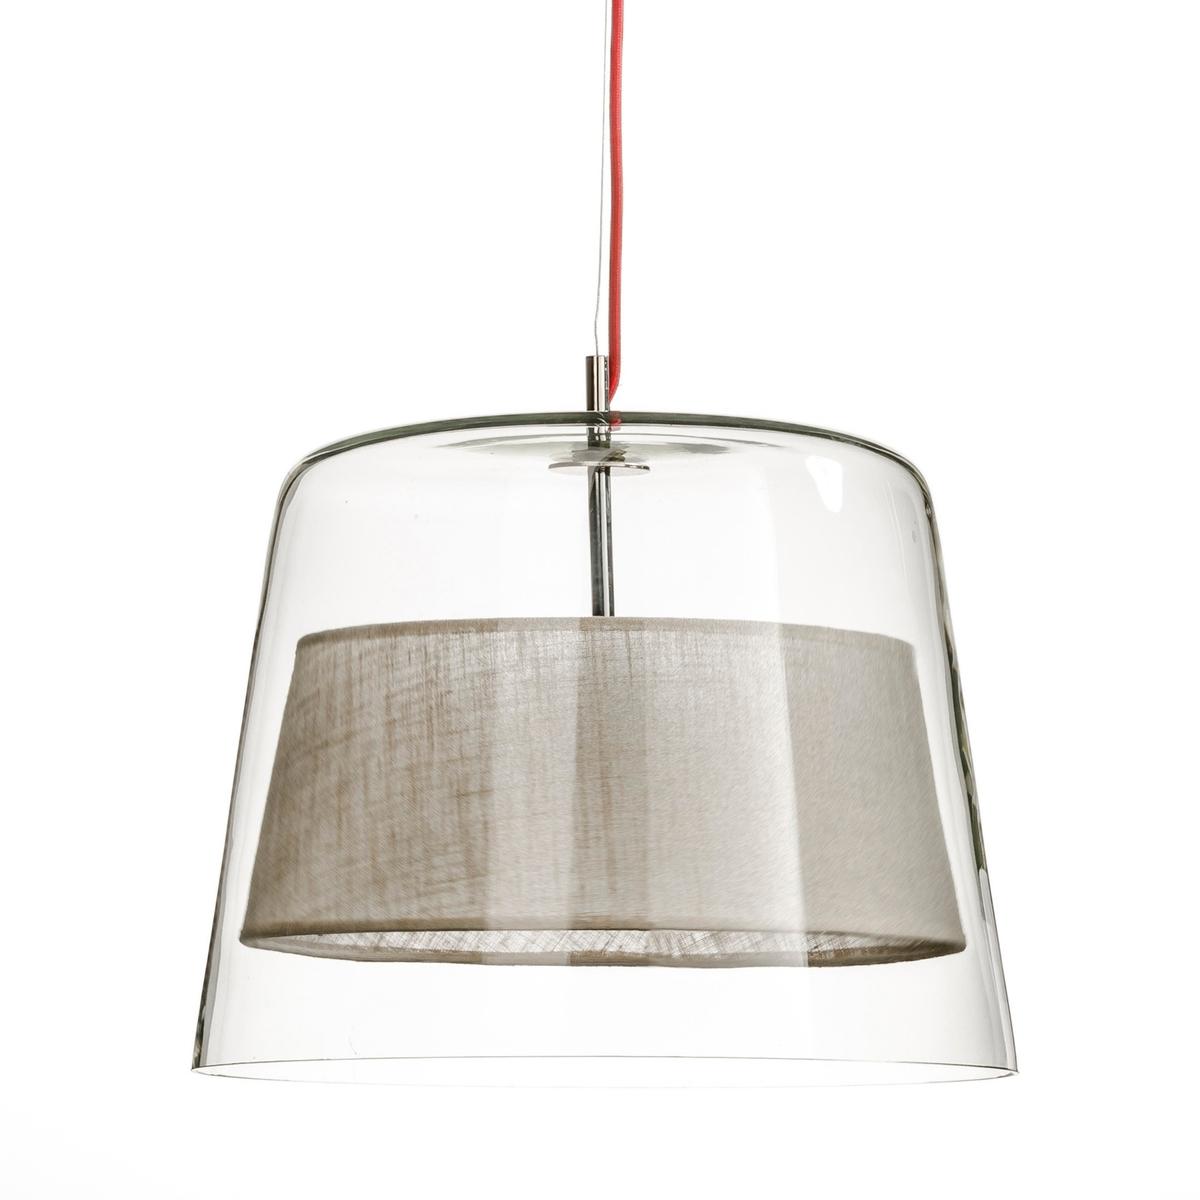 Светильник Duo дизайн Э. Галлины от La Redoute